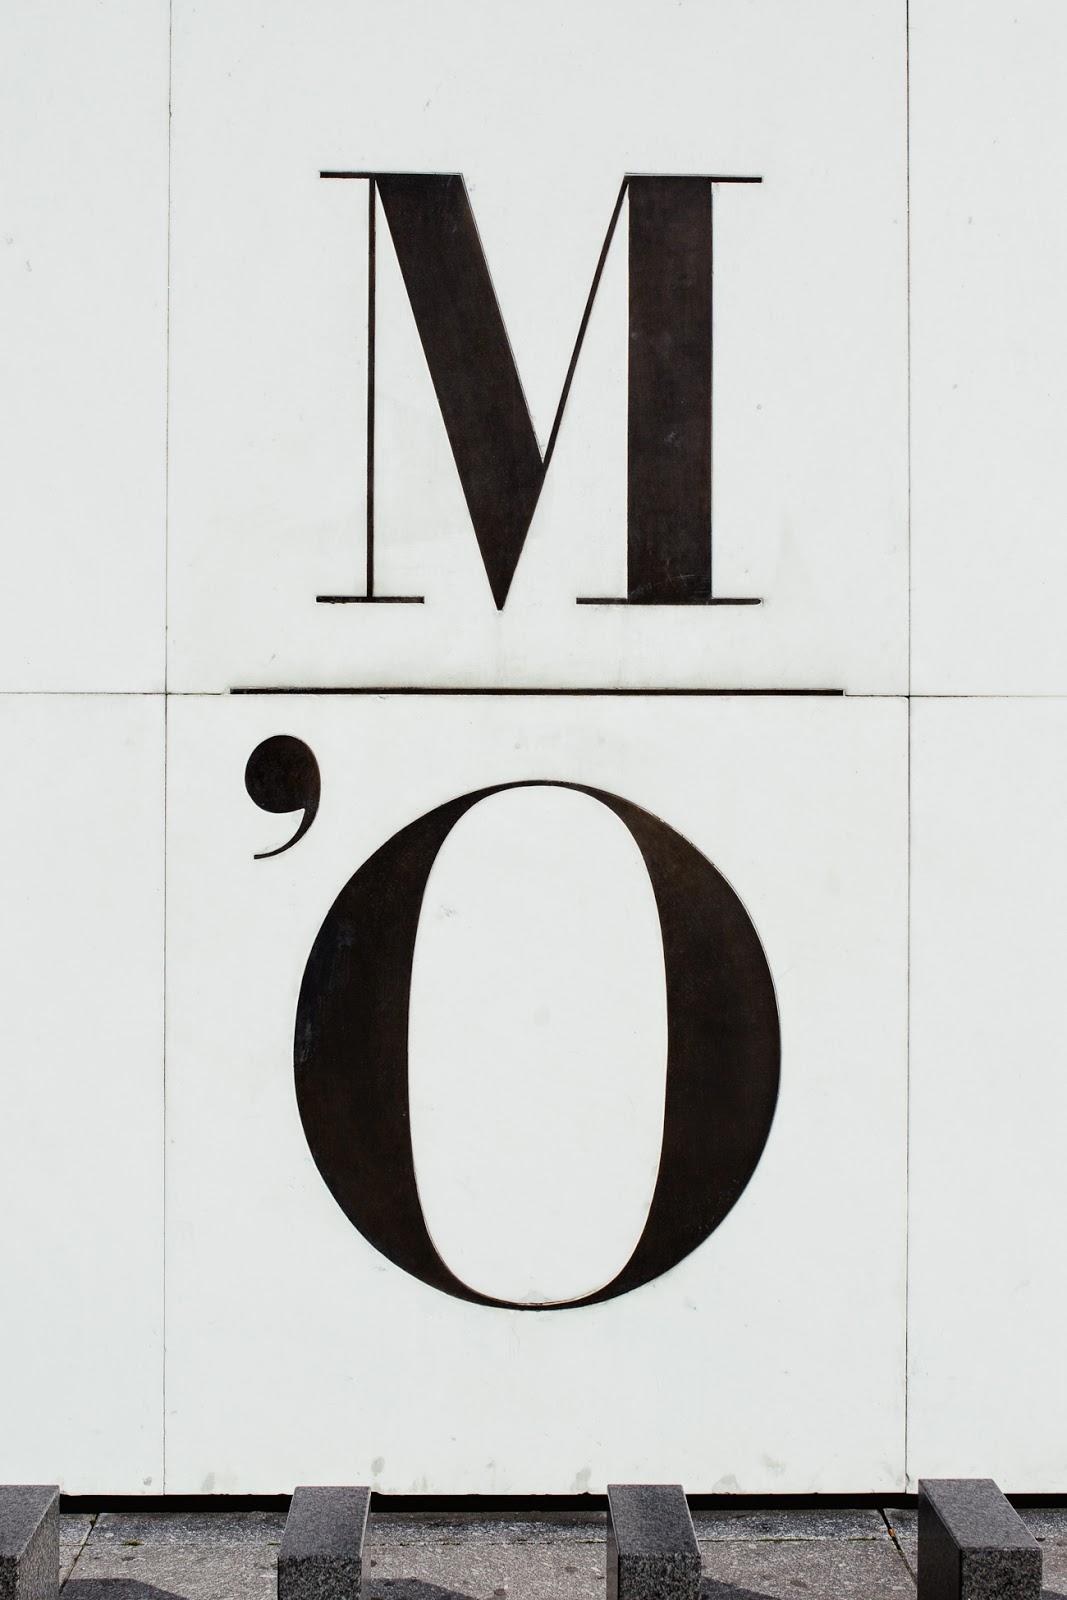 Musee Orsay / blog.jchongstudio.com